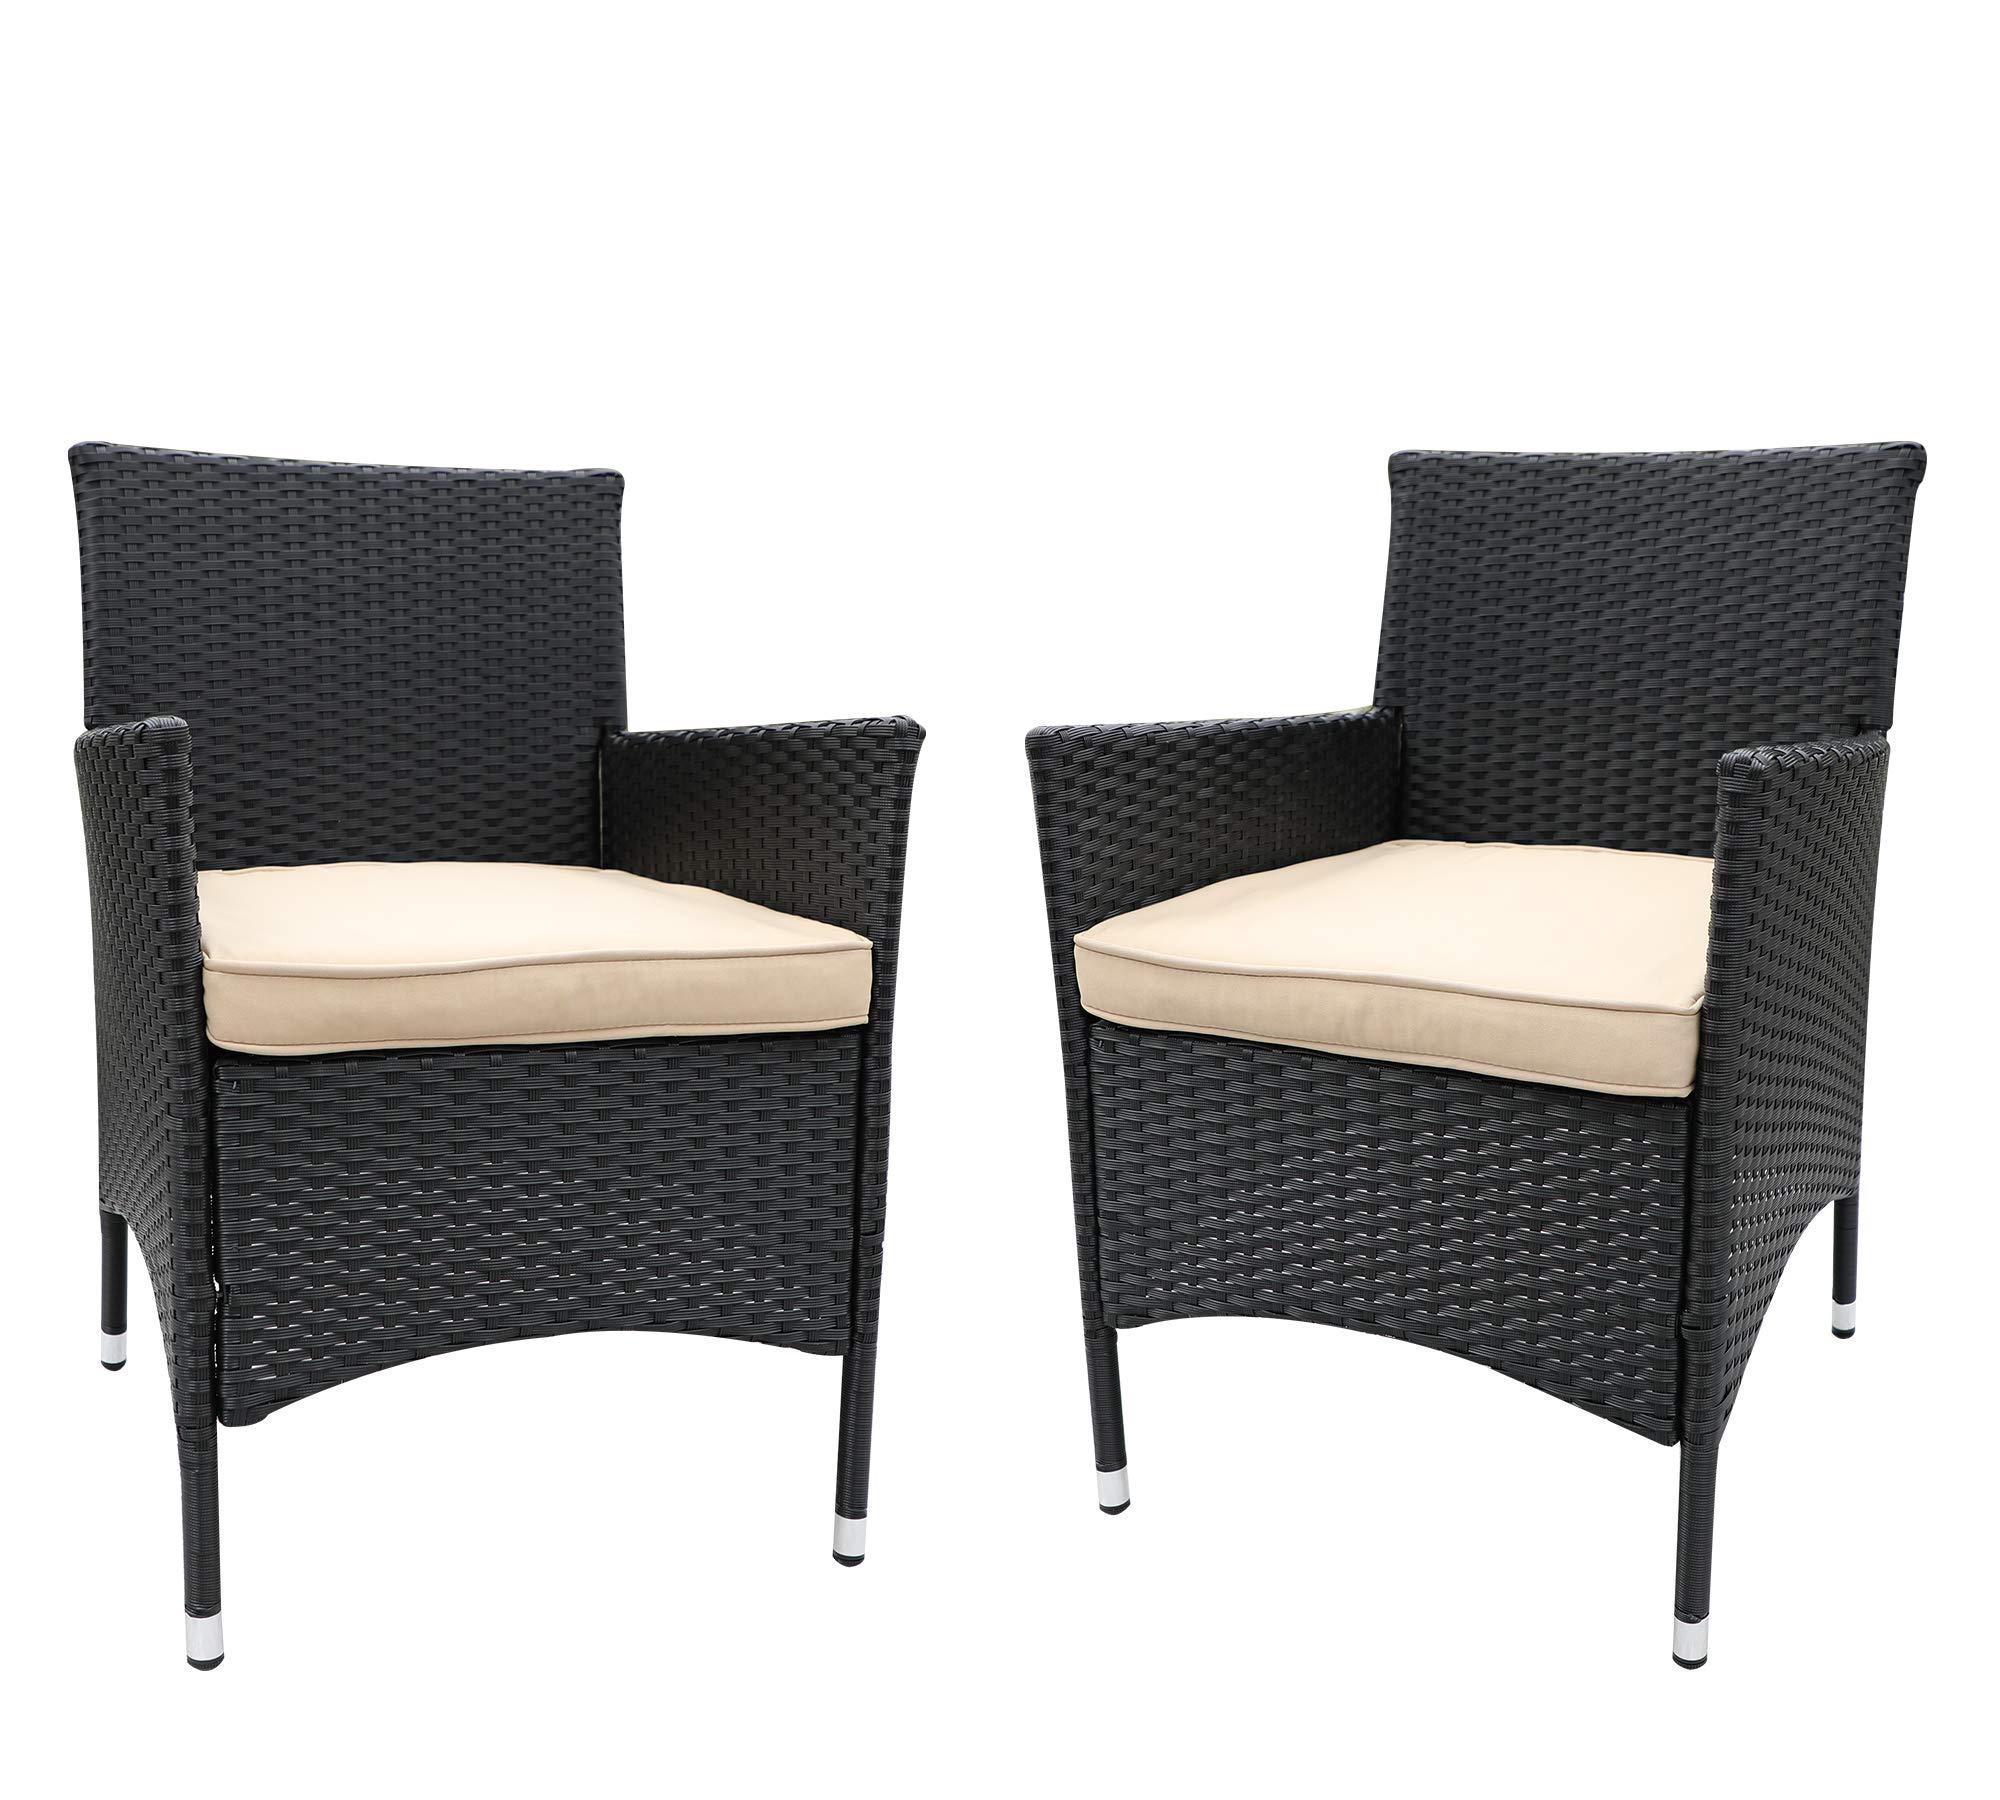 Do4U 2 Pcs Rattan Wicker Outdoor Dining Chairs   Patio, Backyard, Porch, Garden, Poolside (3014-BLK-BRN)